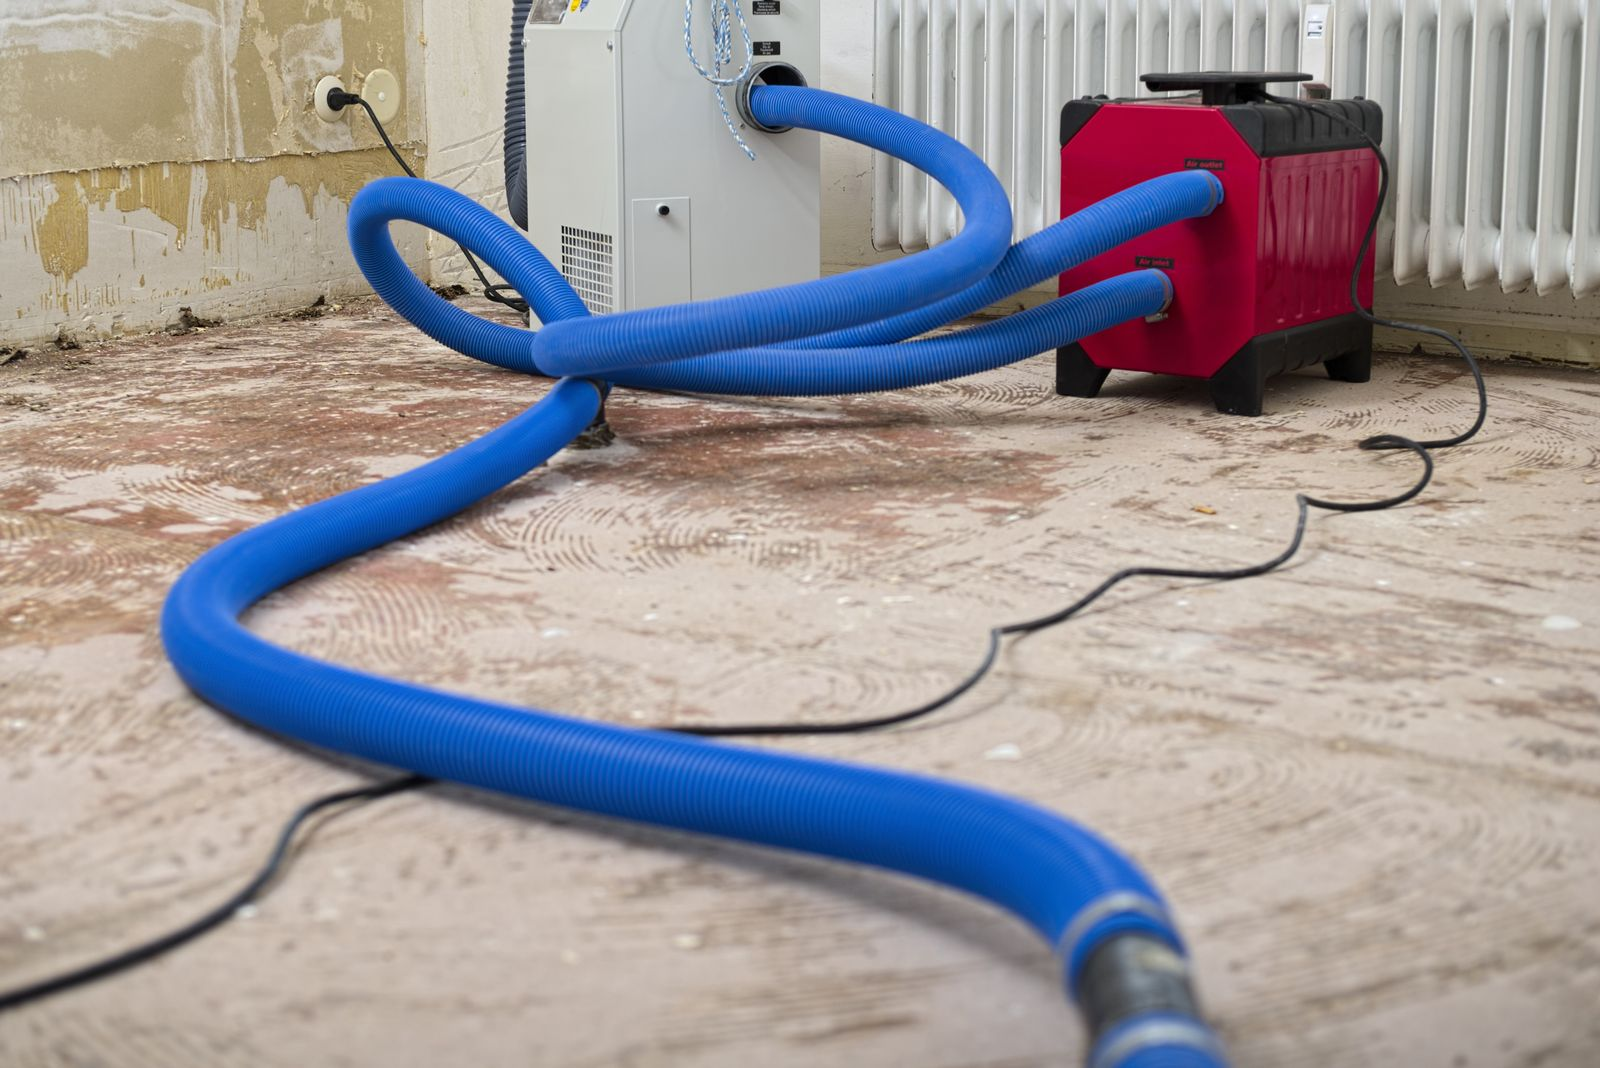 EINMALIGE VERWENDUNG EXPIREN 28.11.2024 Dehumidifier at work in an apartment which is damaged by flooding